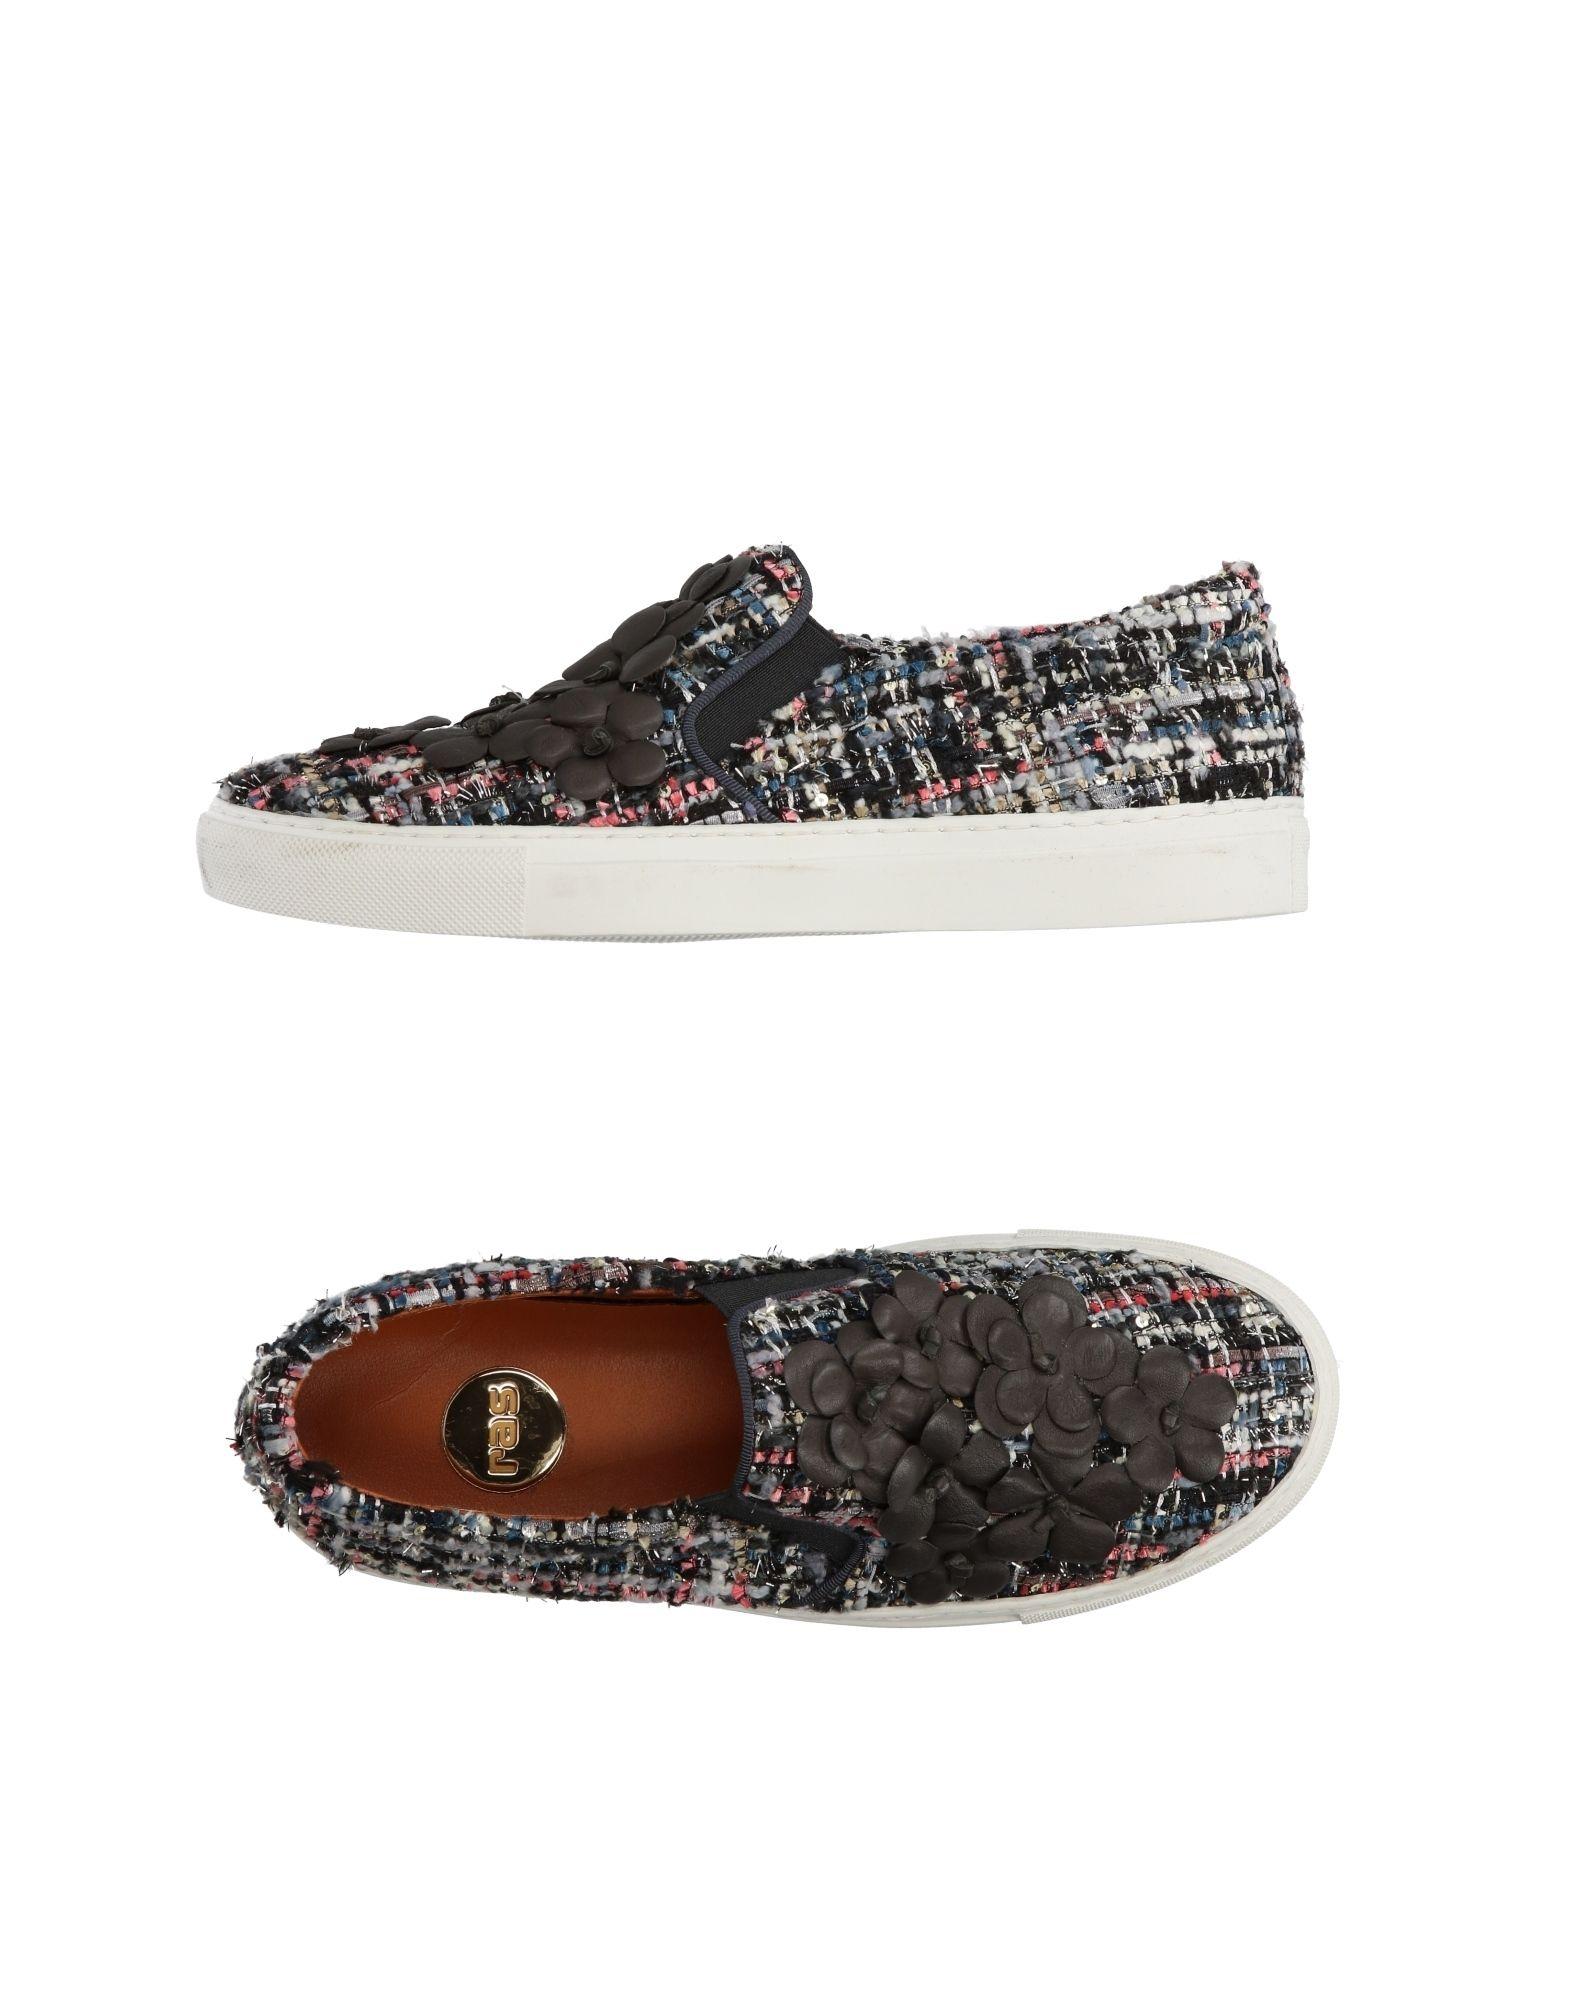 Moda Sneakers Ras Donna - 11240029QH